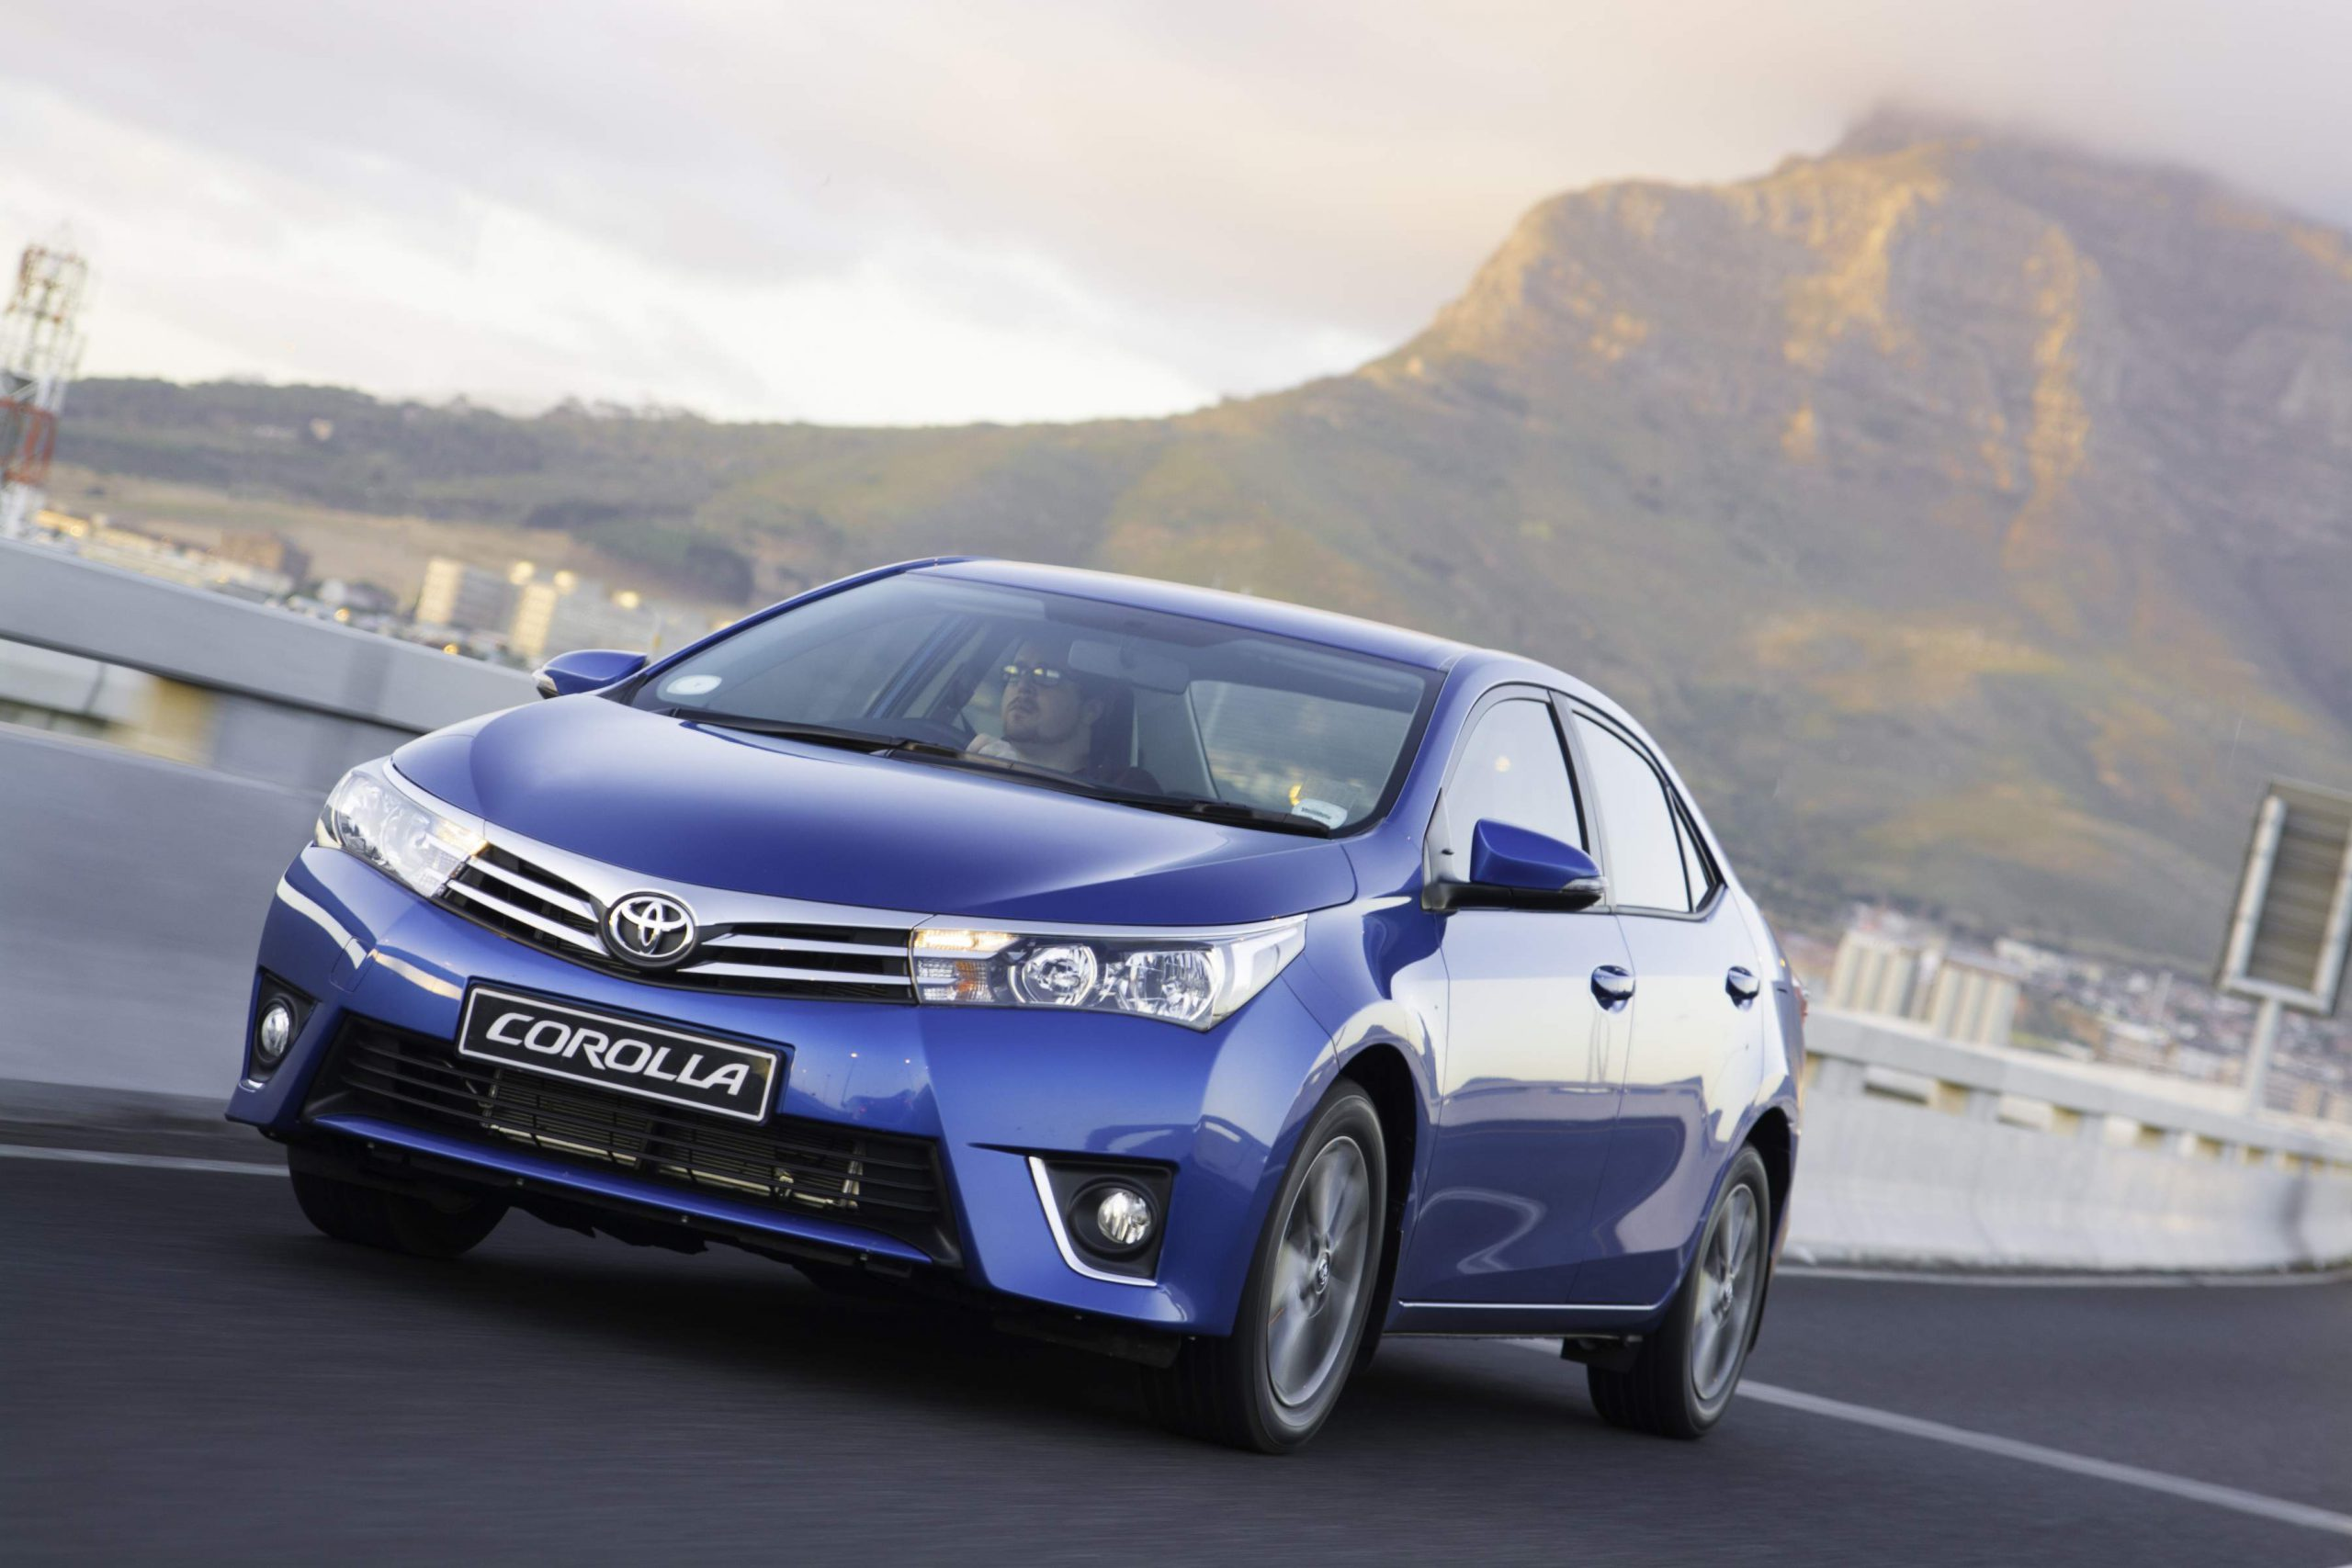 Toyota Corolla (2014): Launch Drive